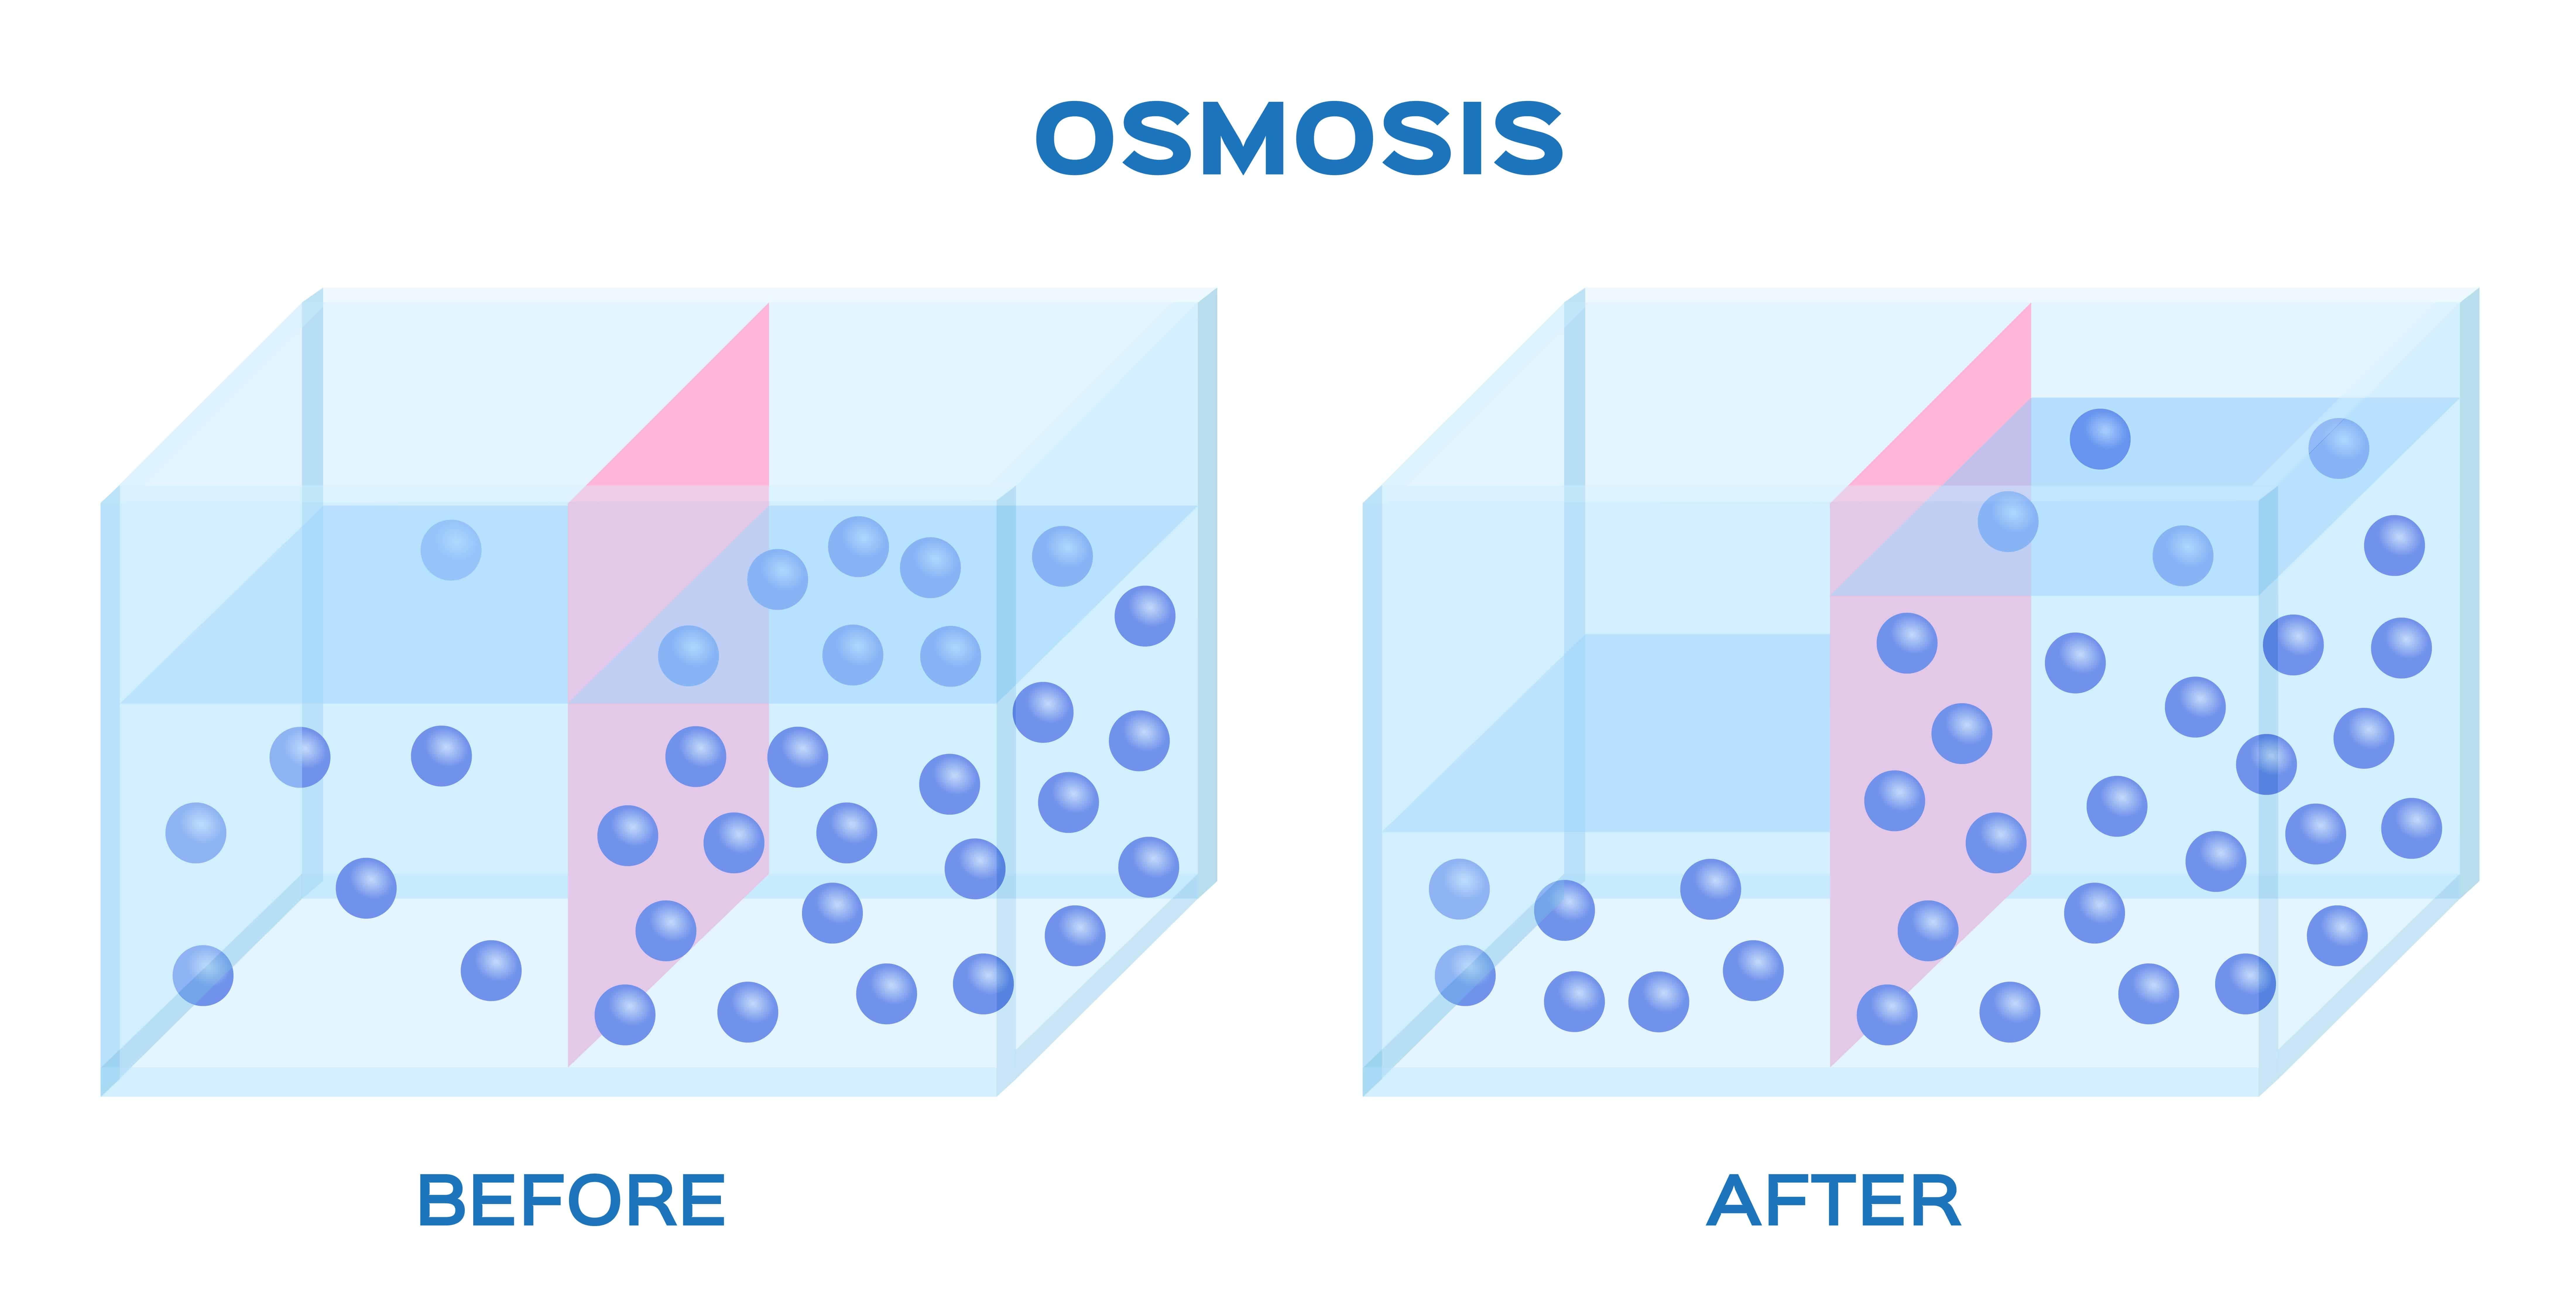 Illustration of Osmosis